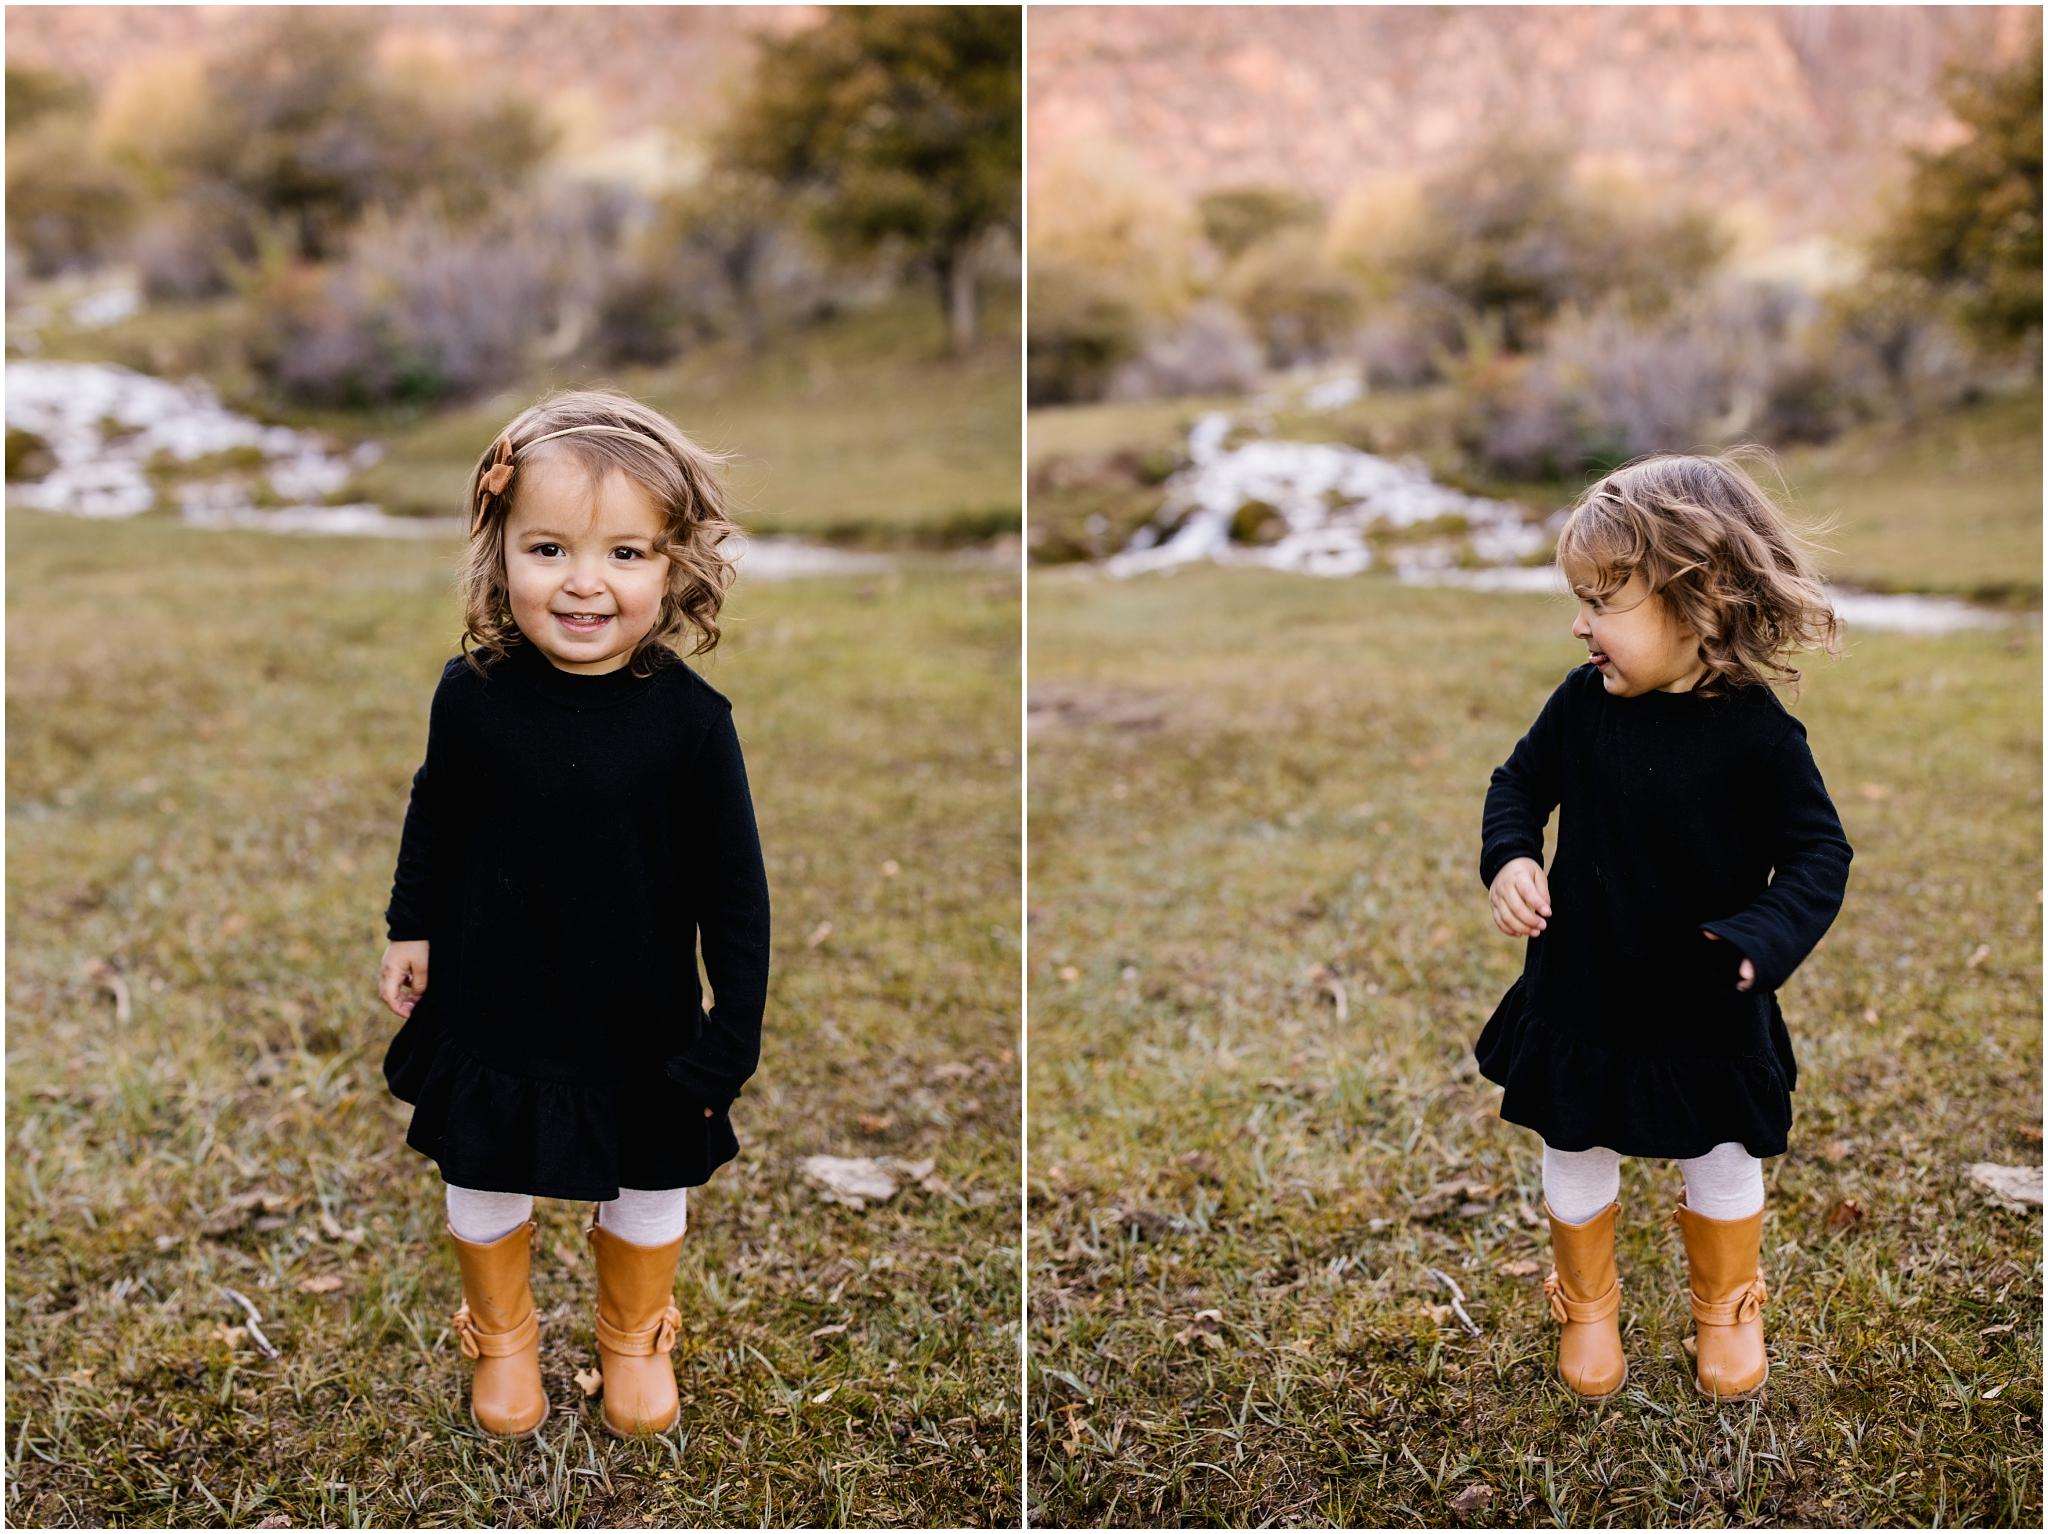 Frandsen-41_Lizzie-B-Imagery-Utah-Family-Photographer-Utah-County-Central-Utah-Park-City-Salt-Lake-City.jpg